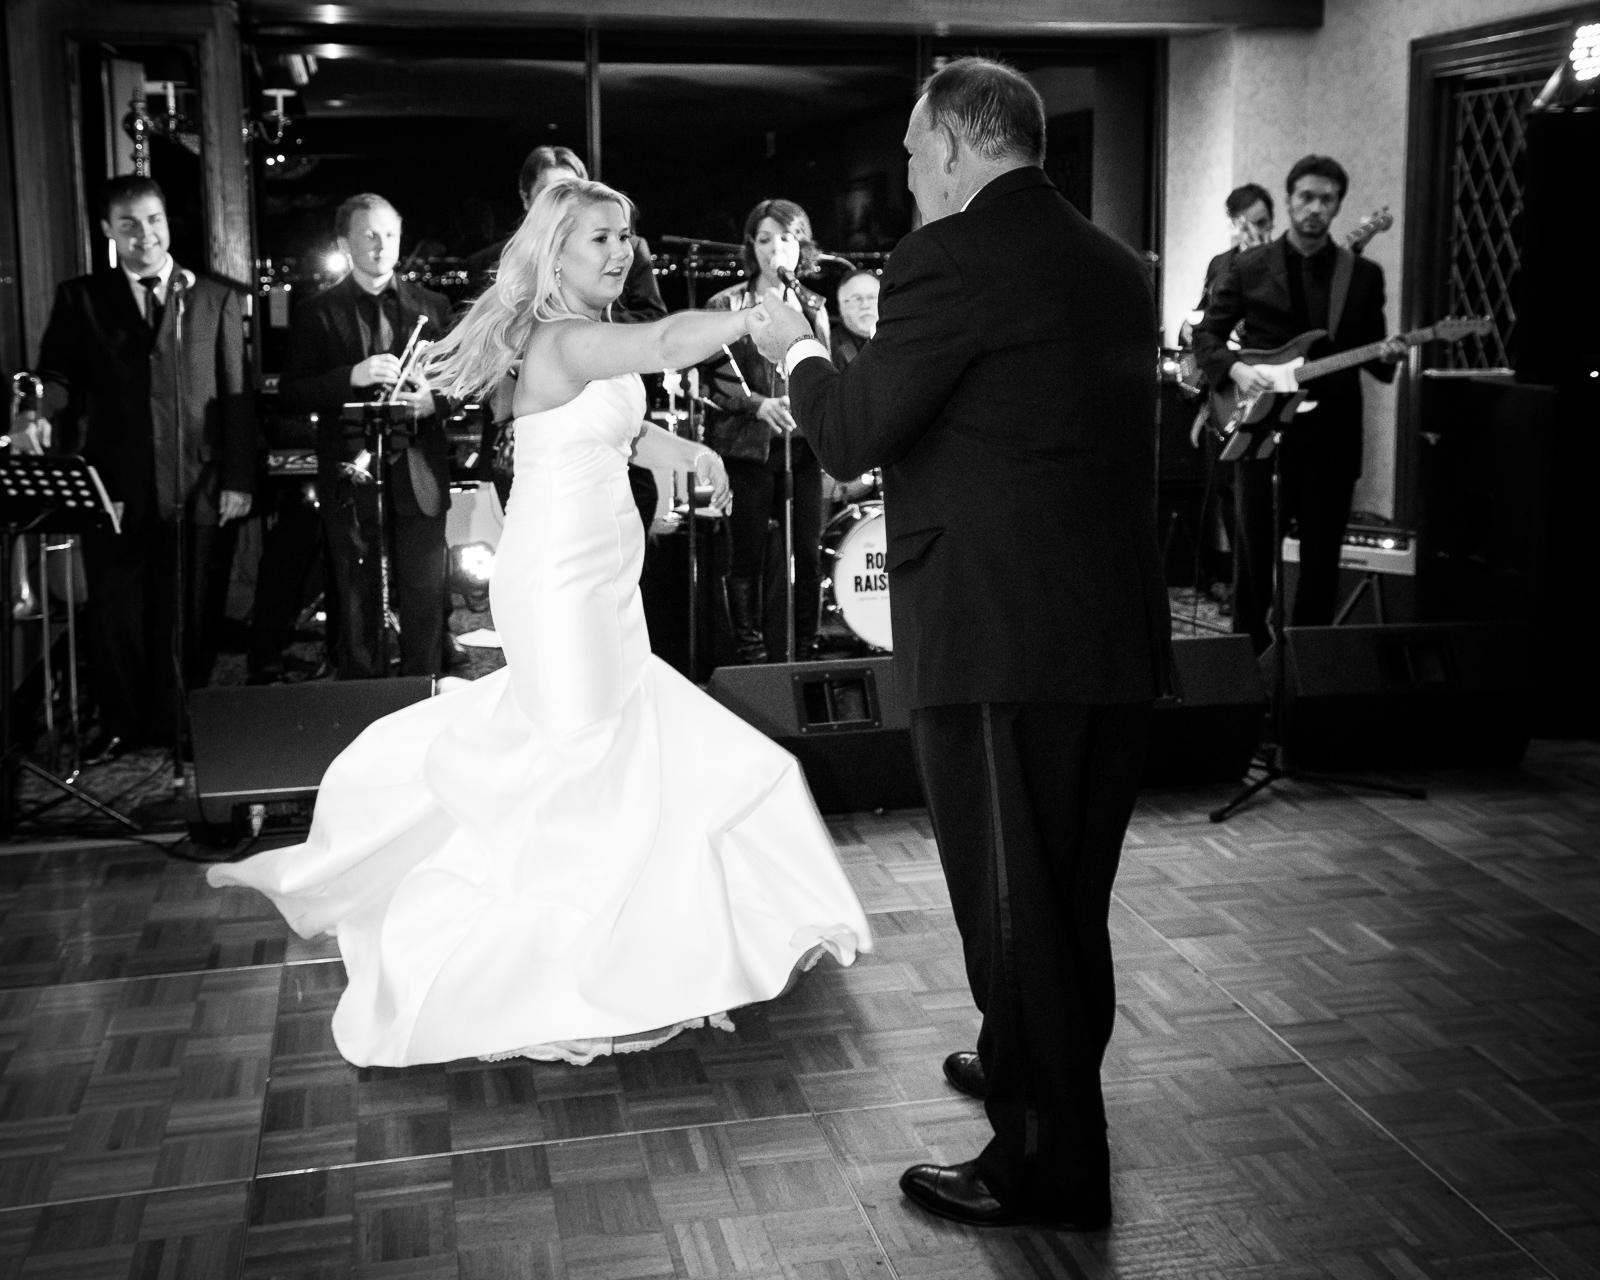 Michael-Napier-Weddings-Cogill-Bizzle-Album-2 (48).jpg